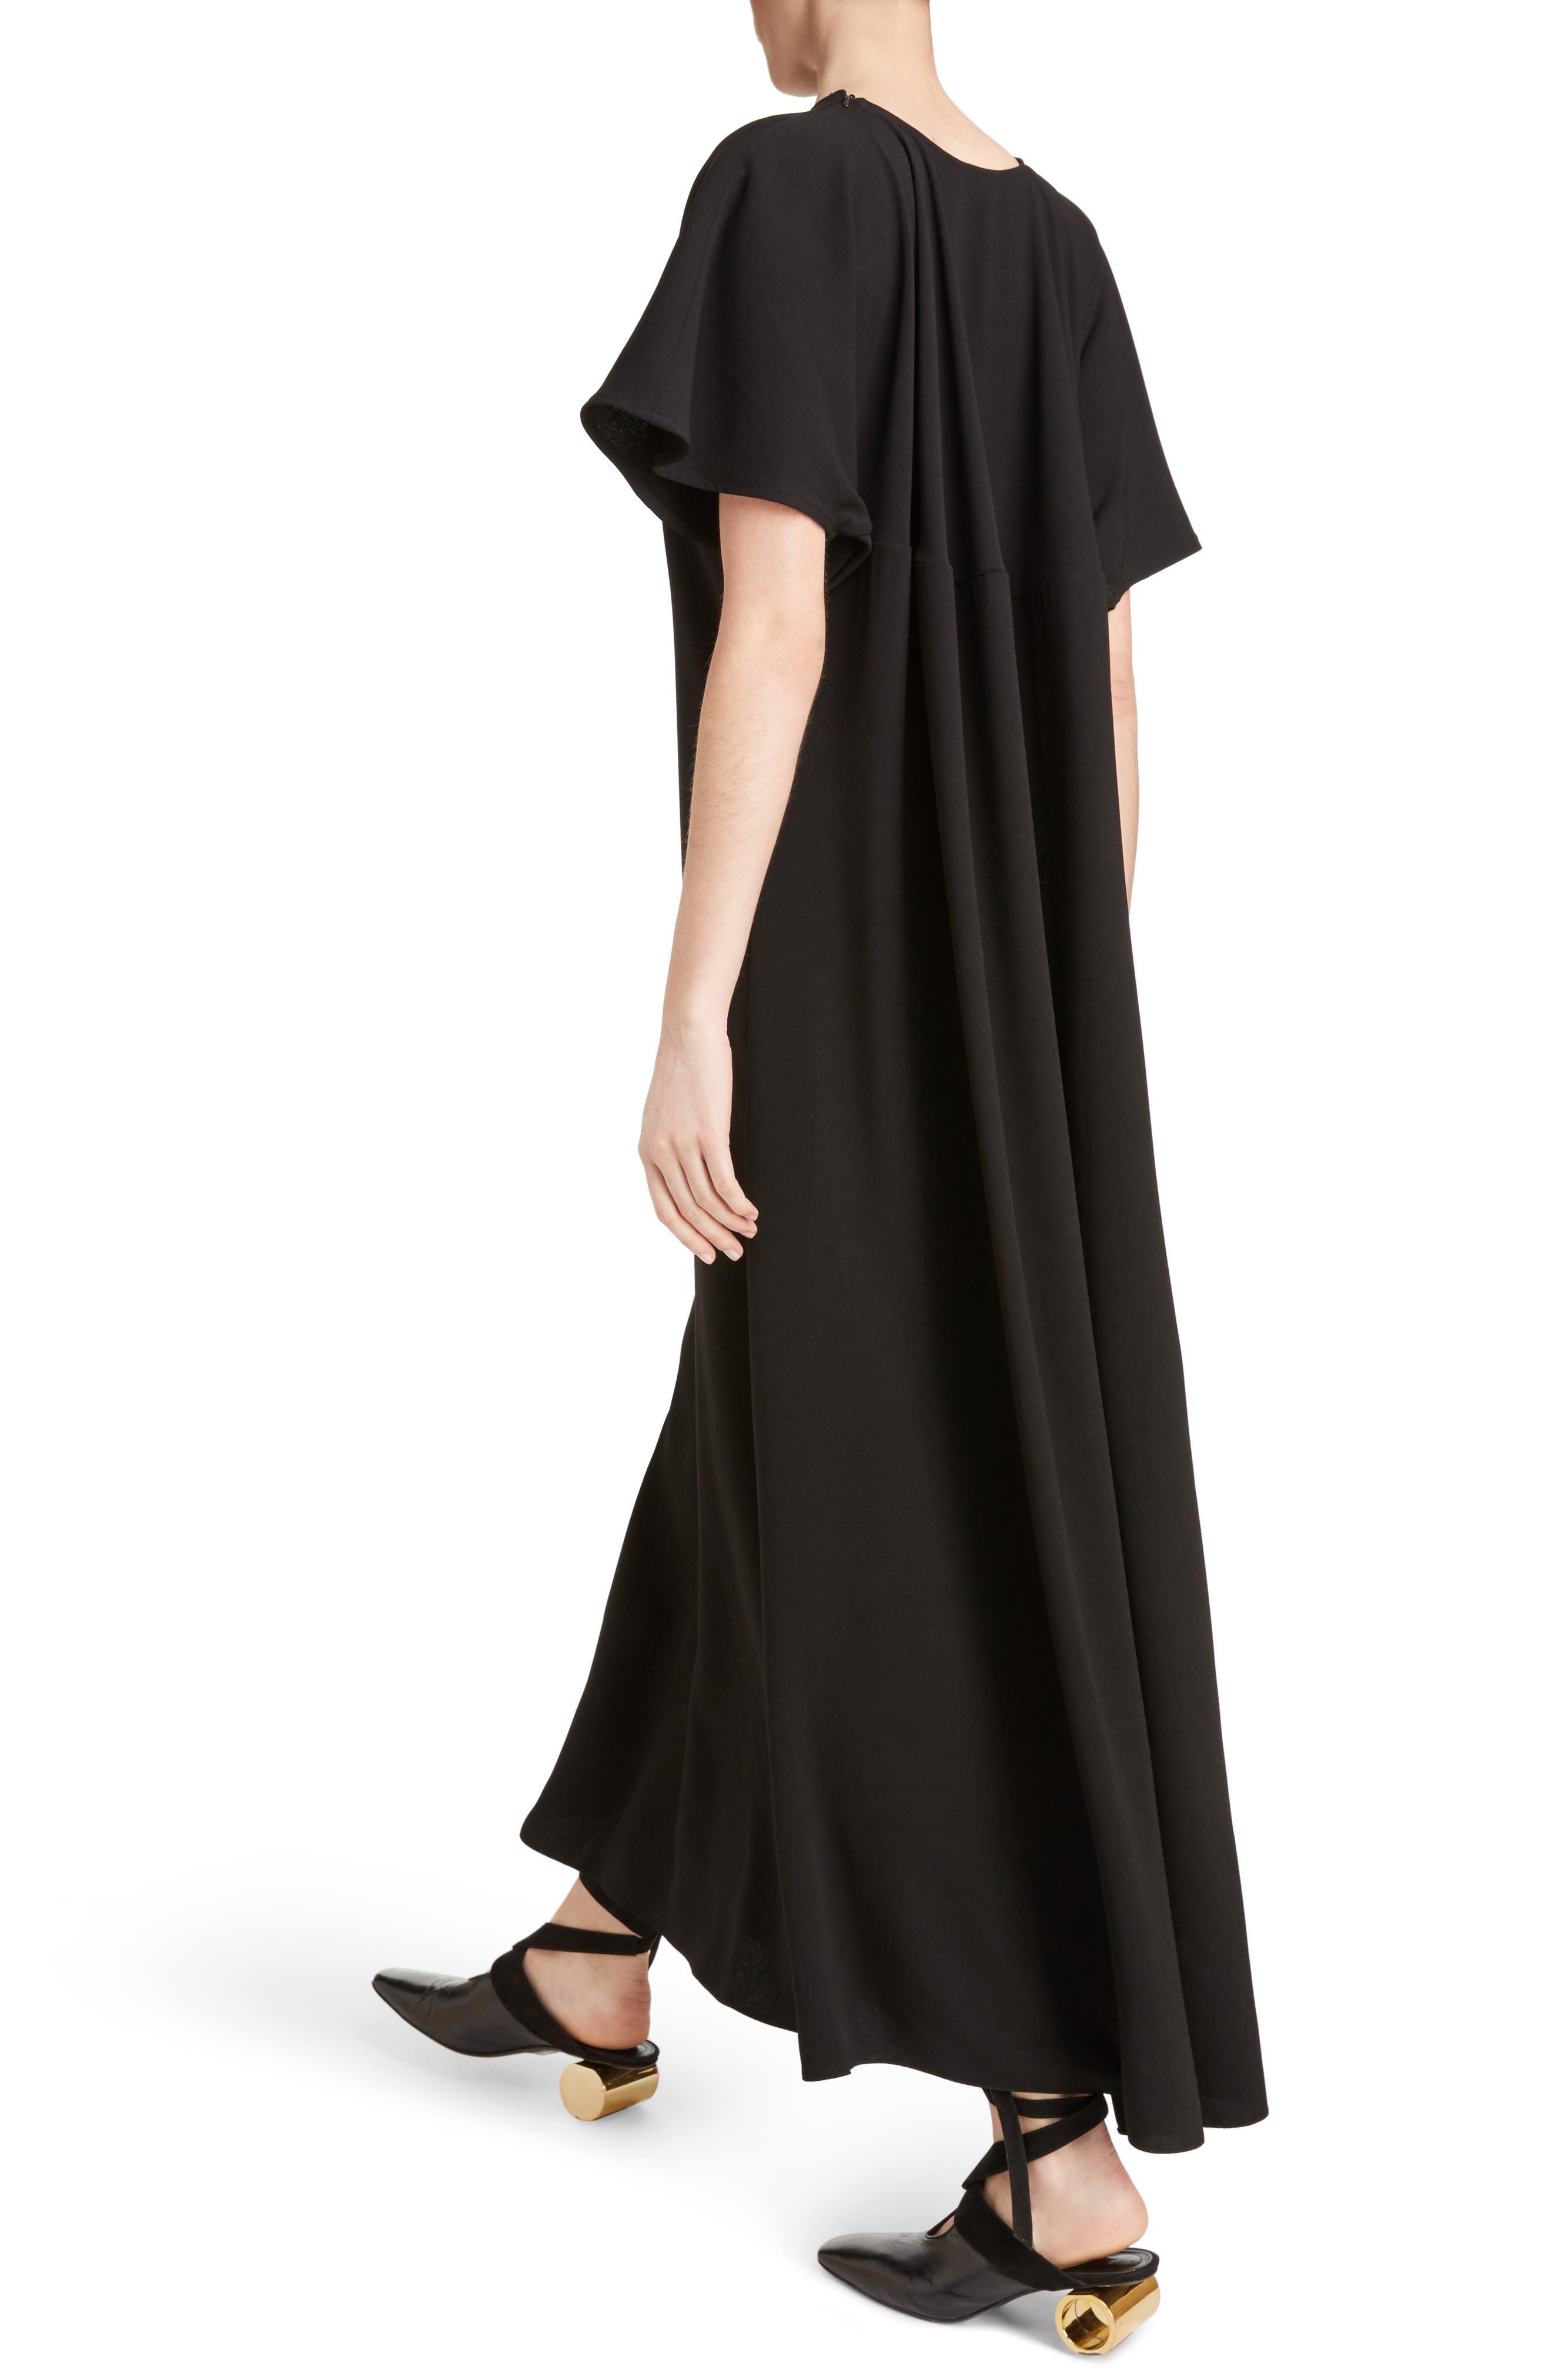 J.W.ANDERSON Cap Sleeve Maxi Dress,                             Alternate thumbnail 4, color,                             001